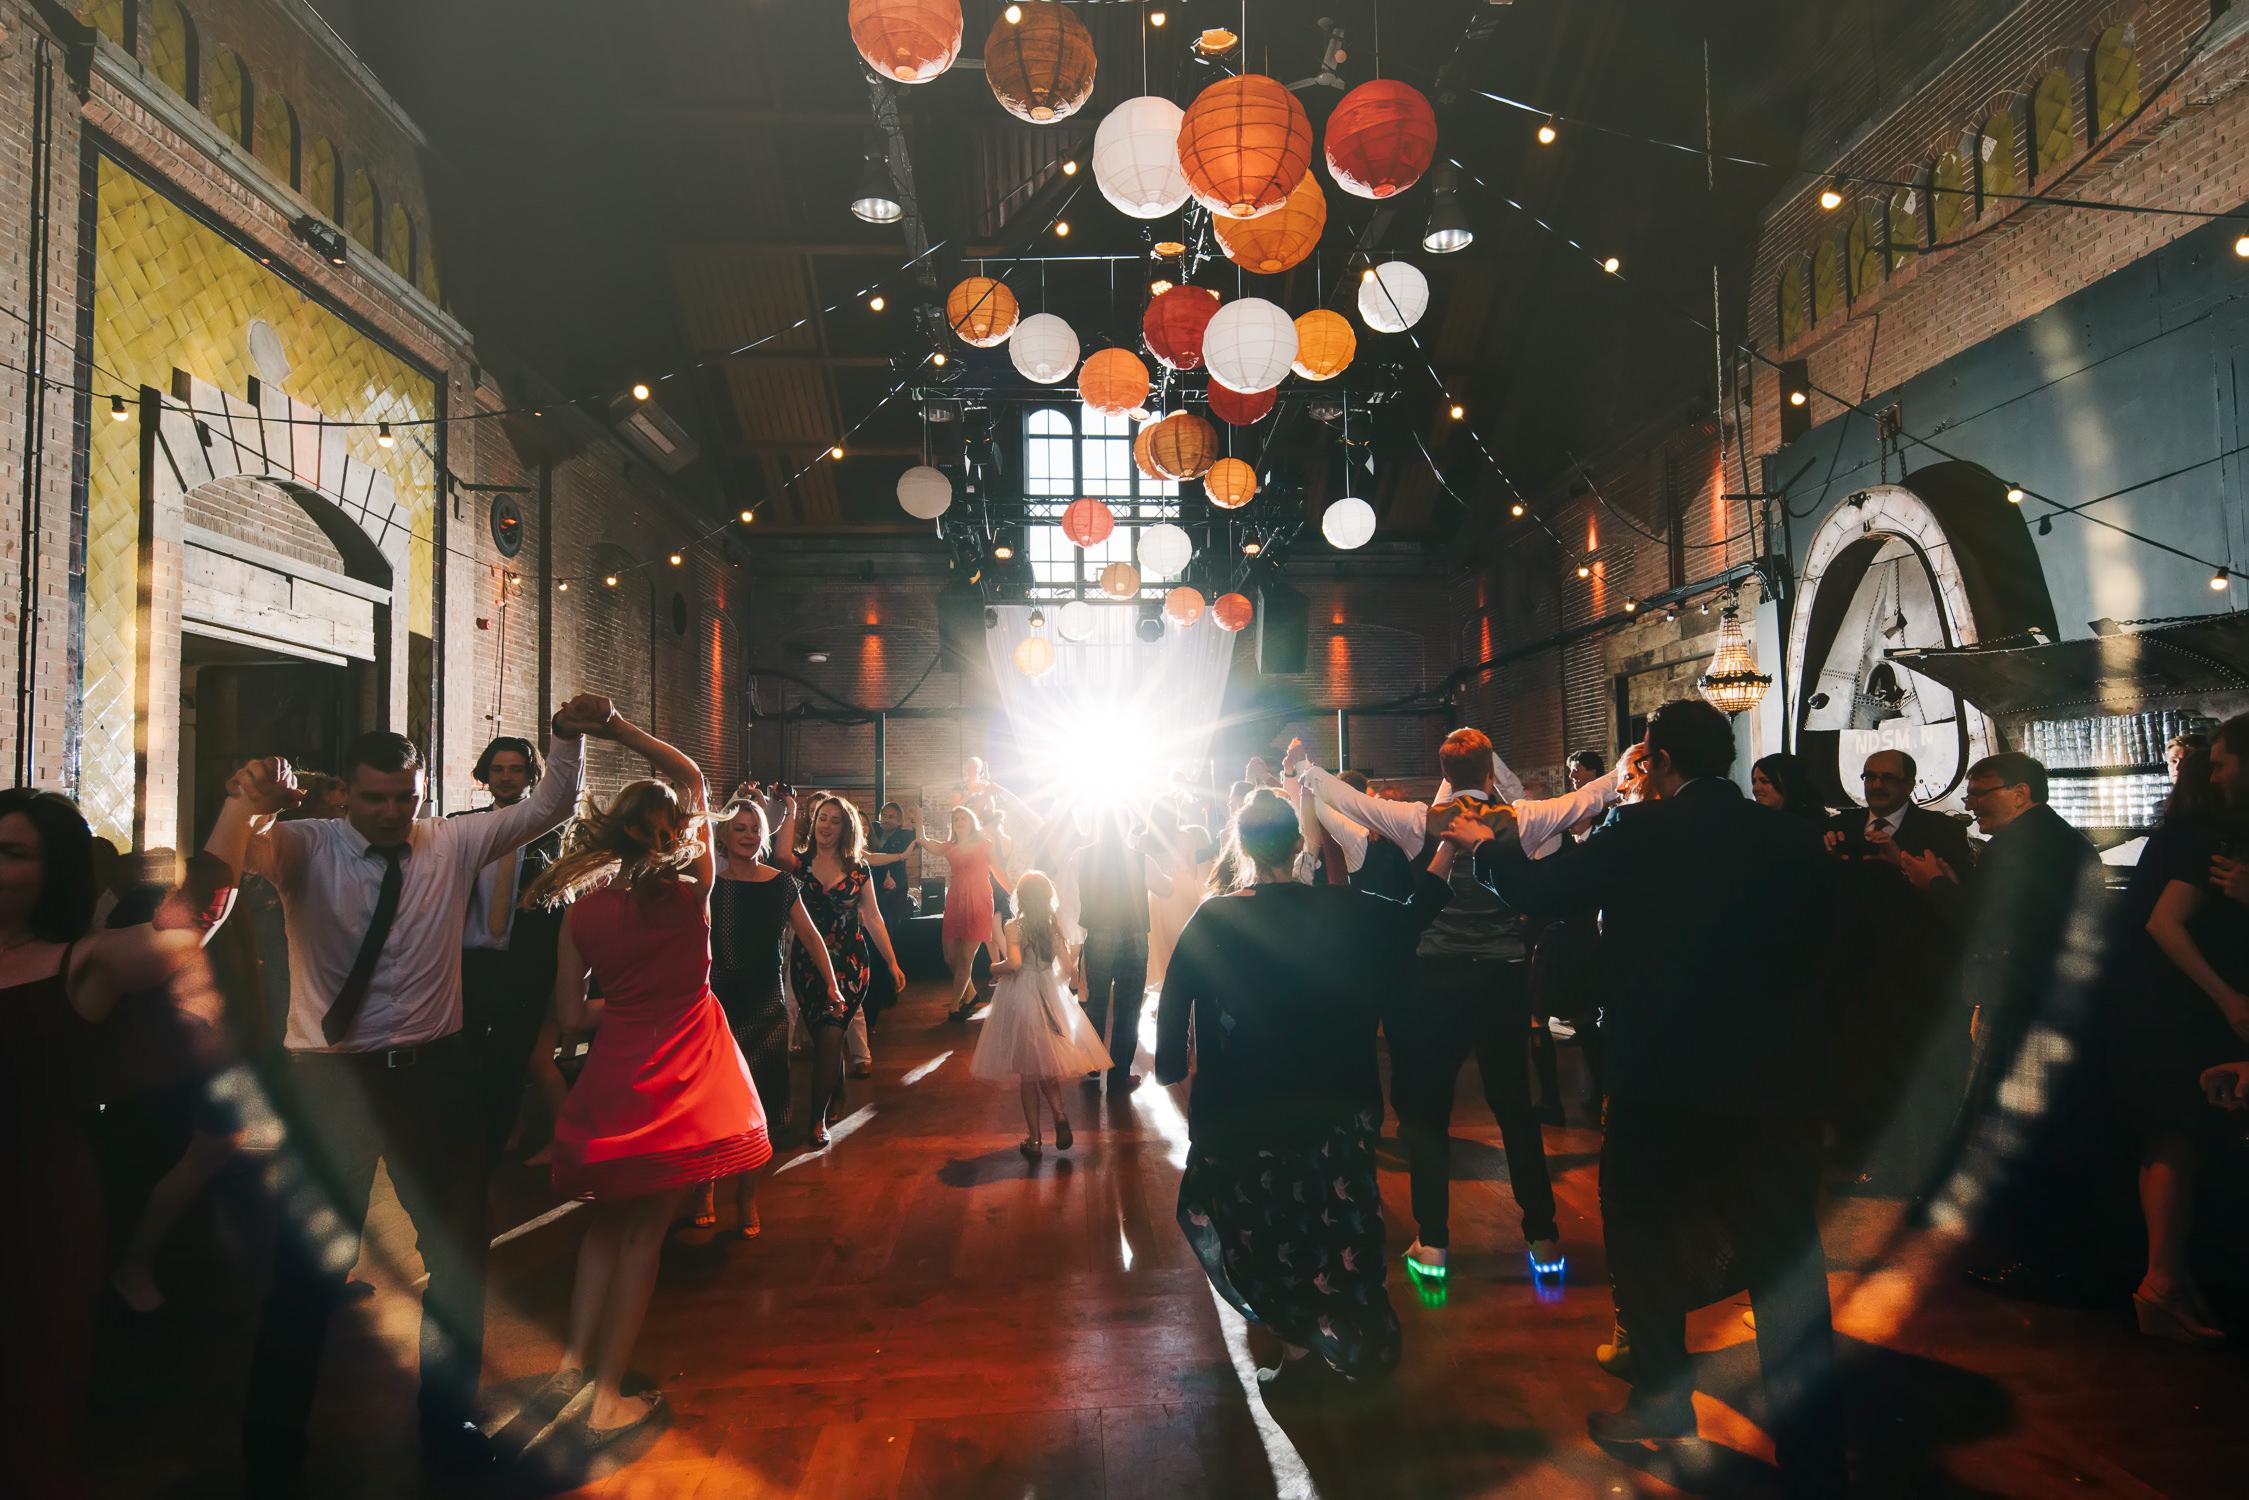 amsterdam-wedding-photographer-trouwfotograaf-bruidsfotograaf-mark-hadden-bruidsfotografie-David & Ronald-359-1.jpg